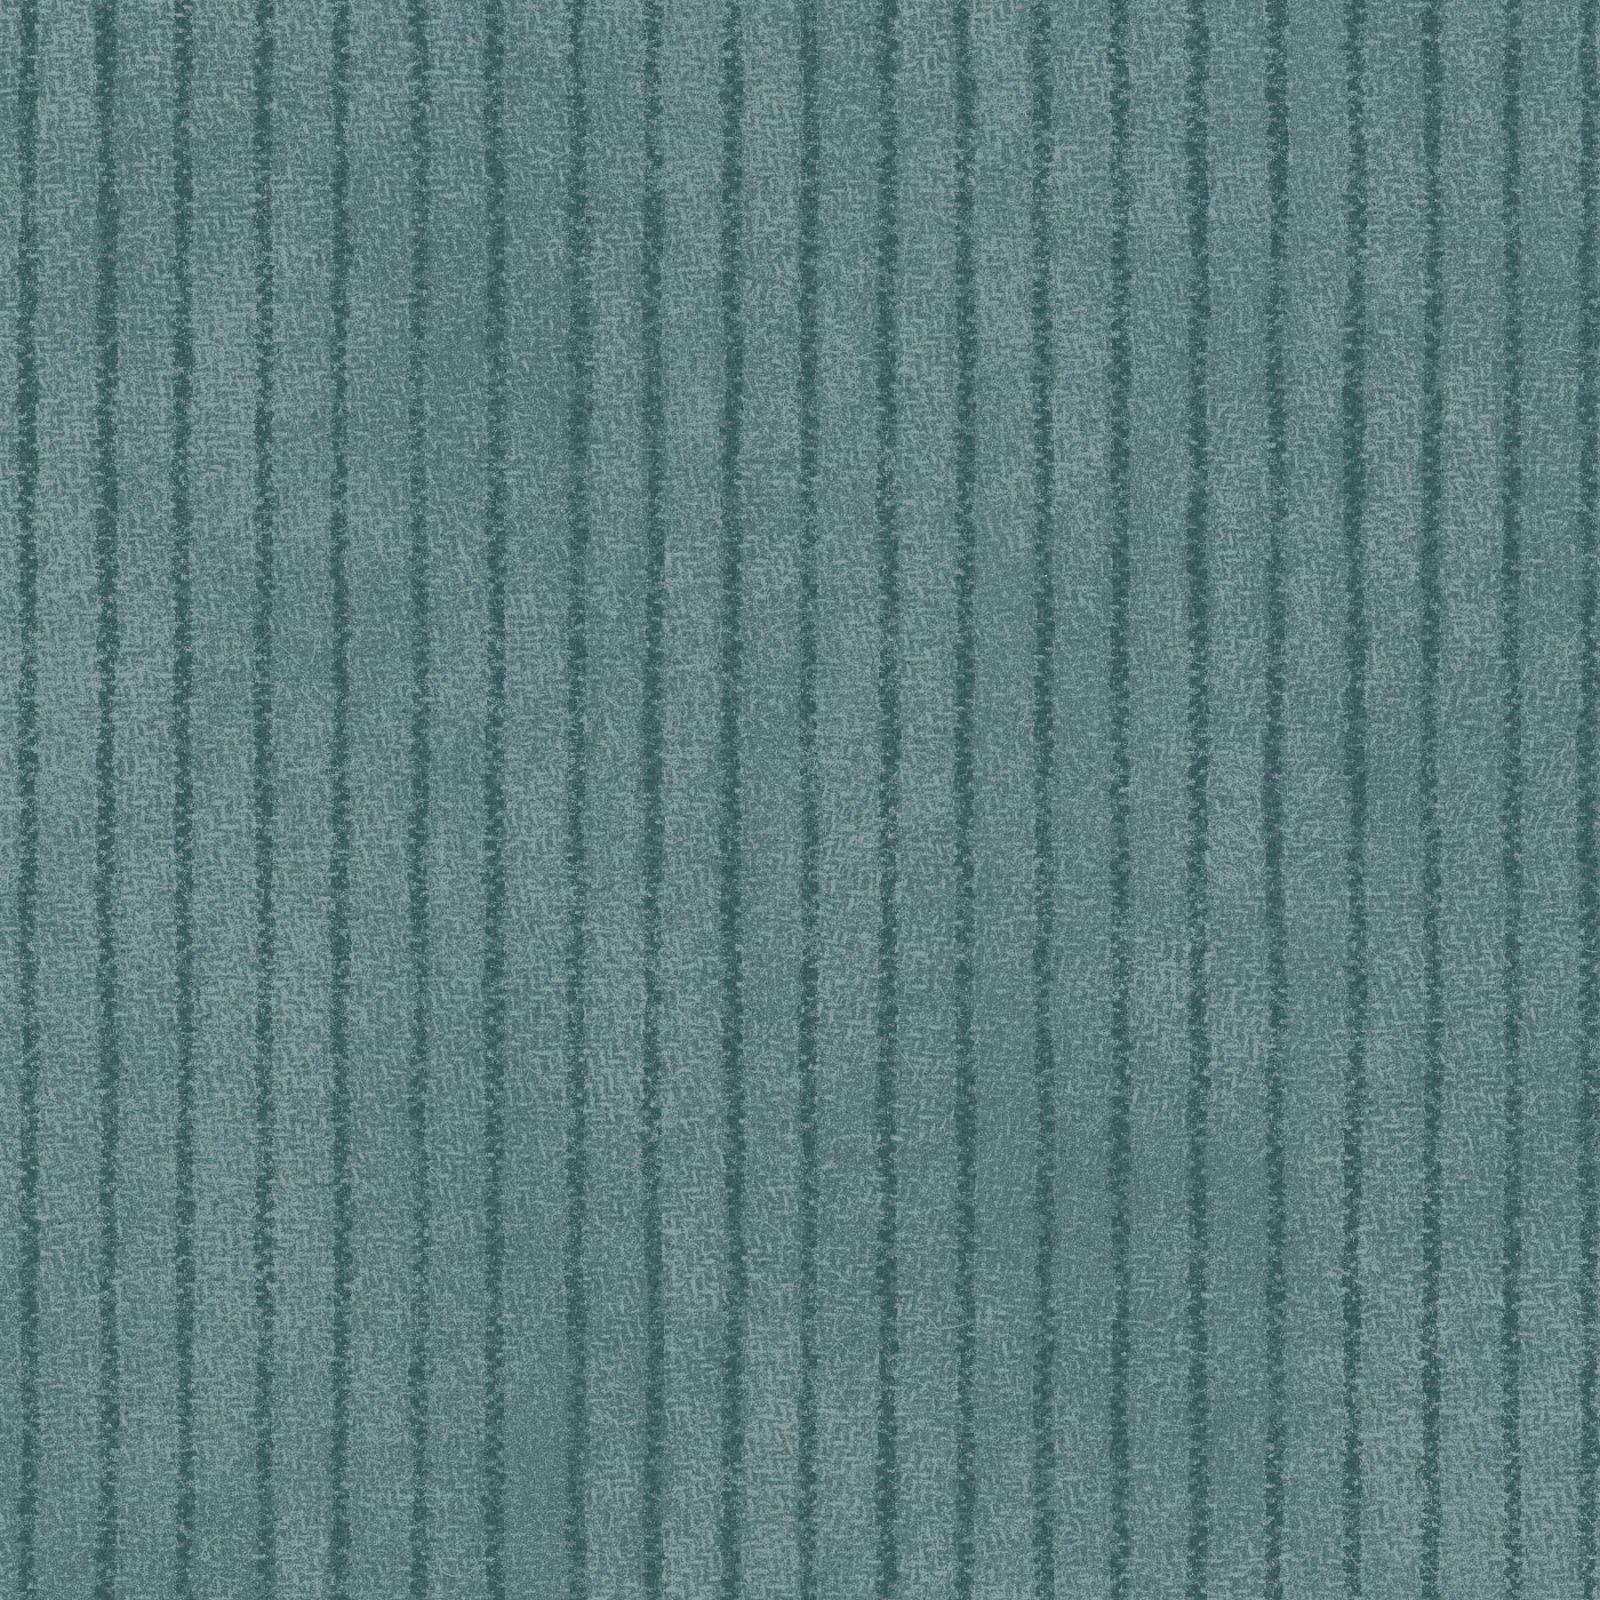 Woolies MASF18508-Q